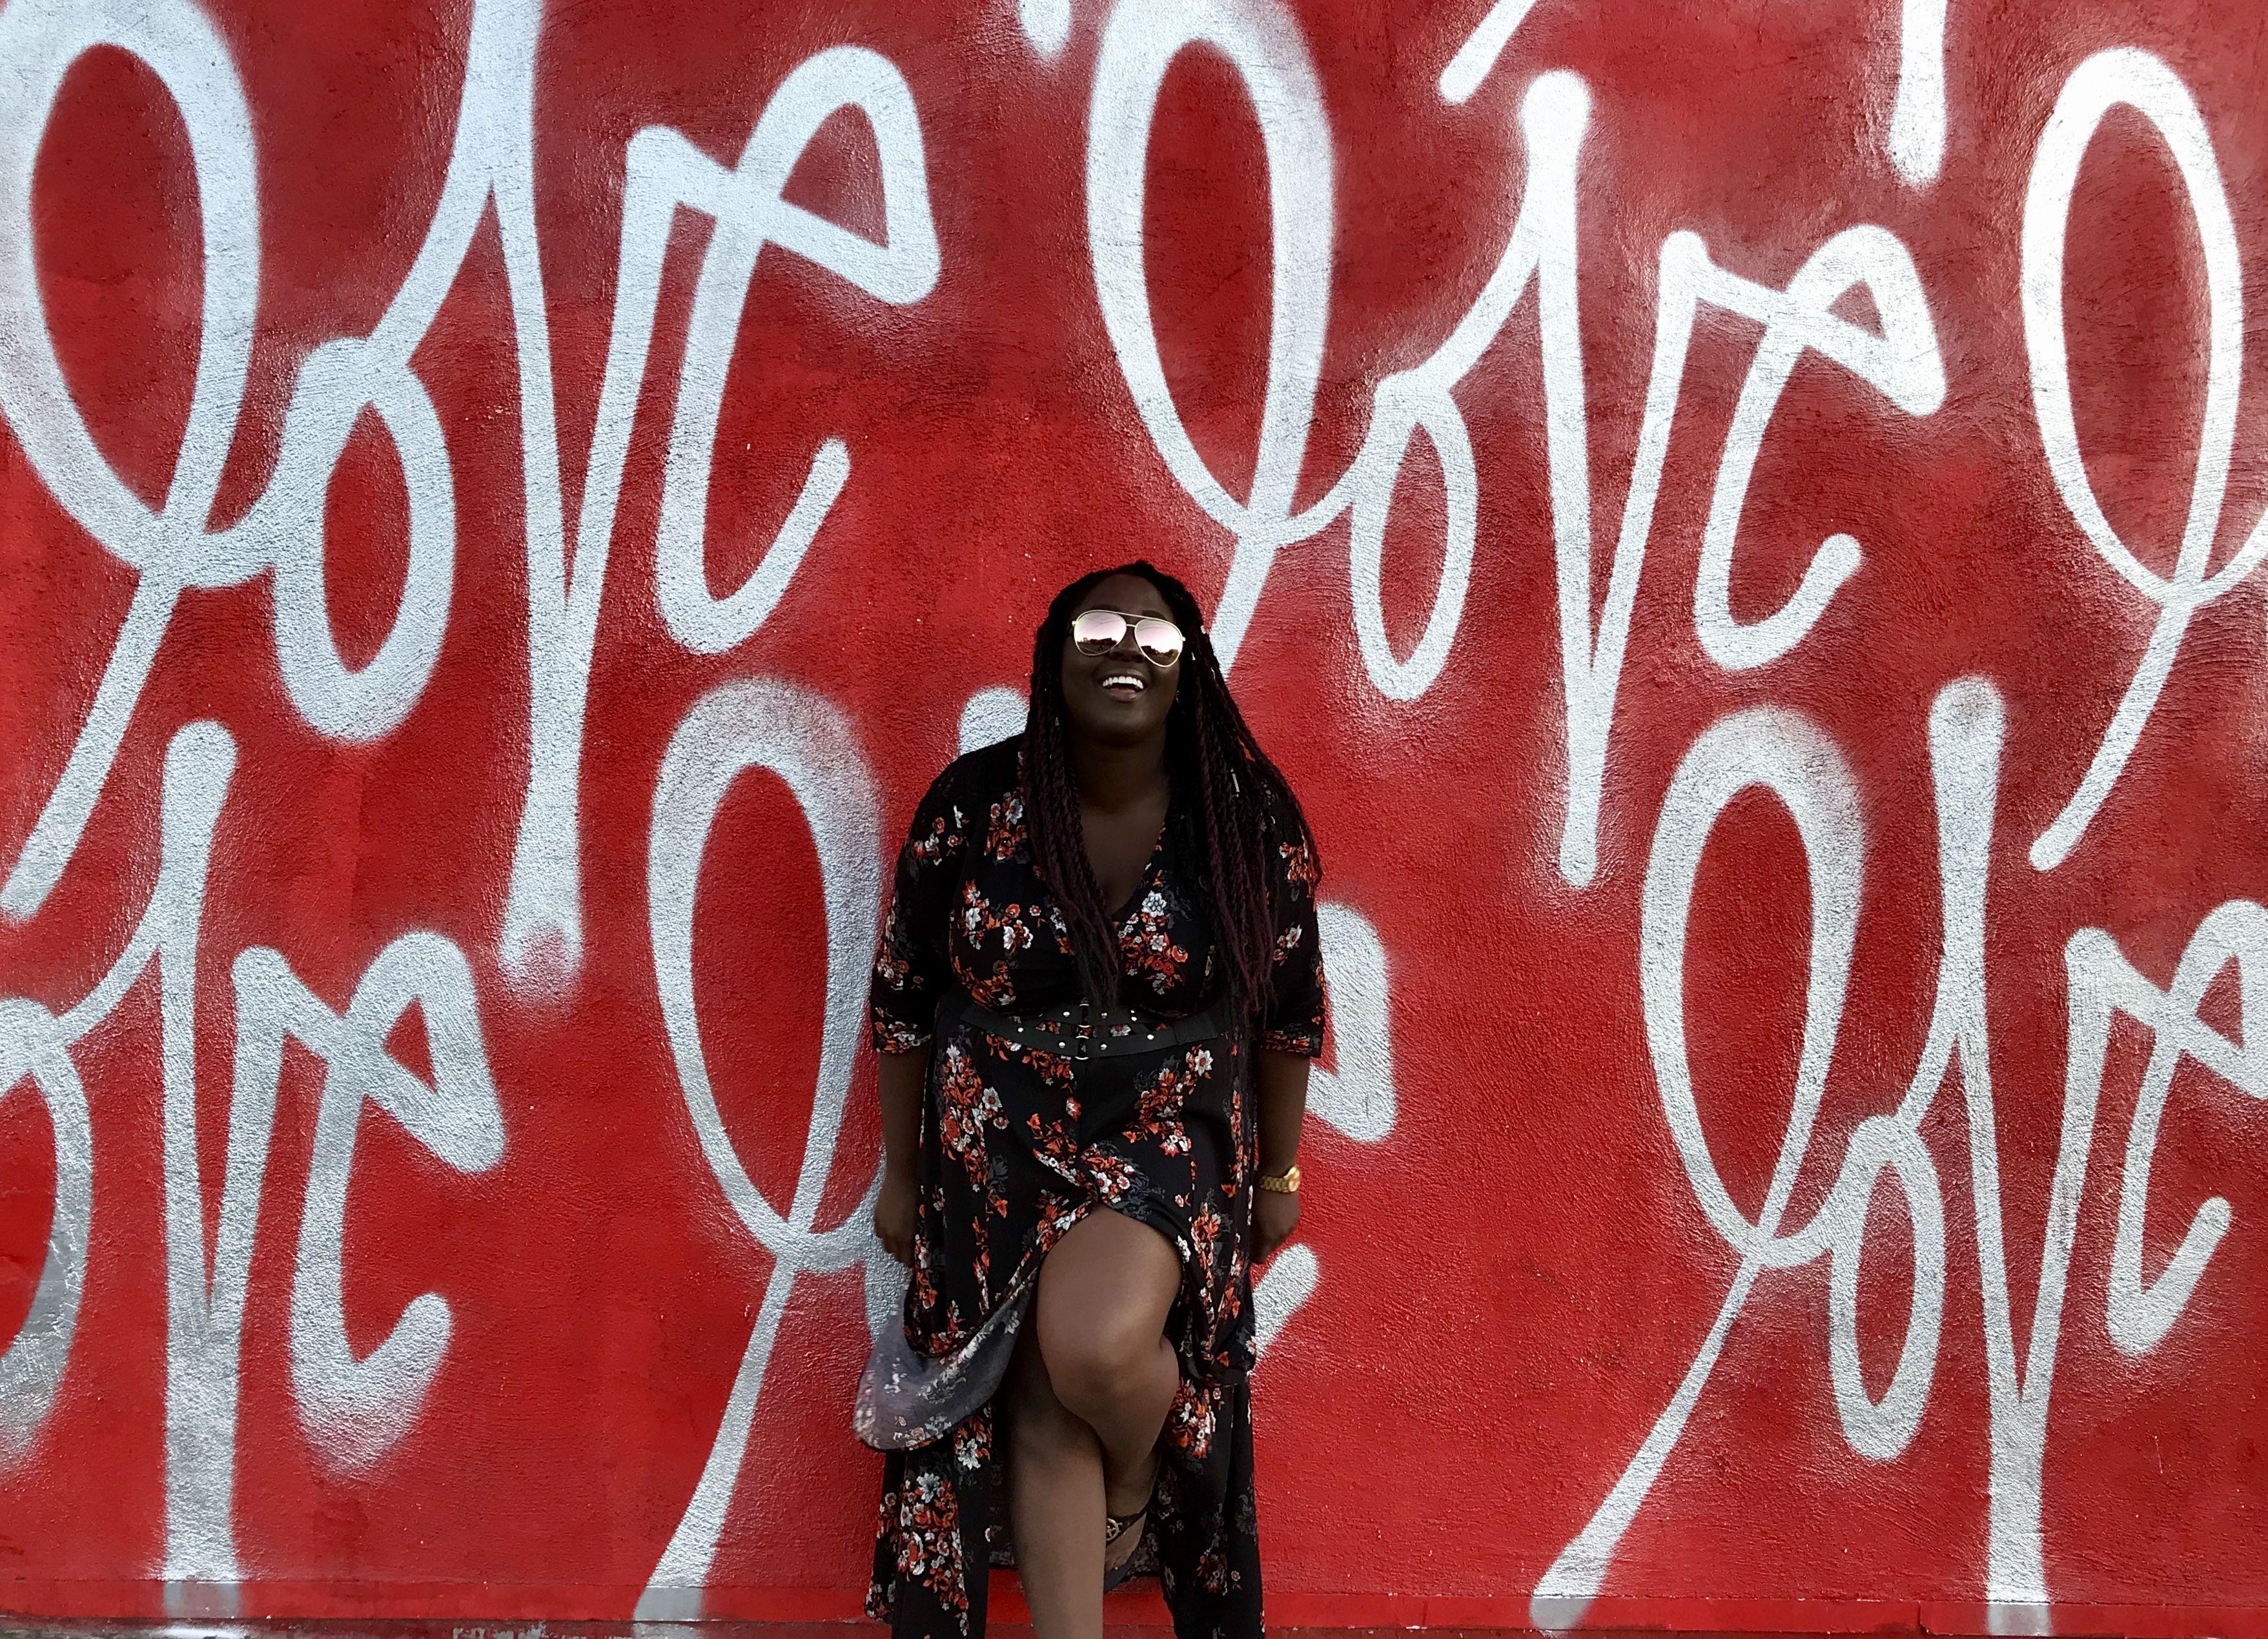 Love wall at smash box studios in culver city ca